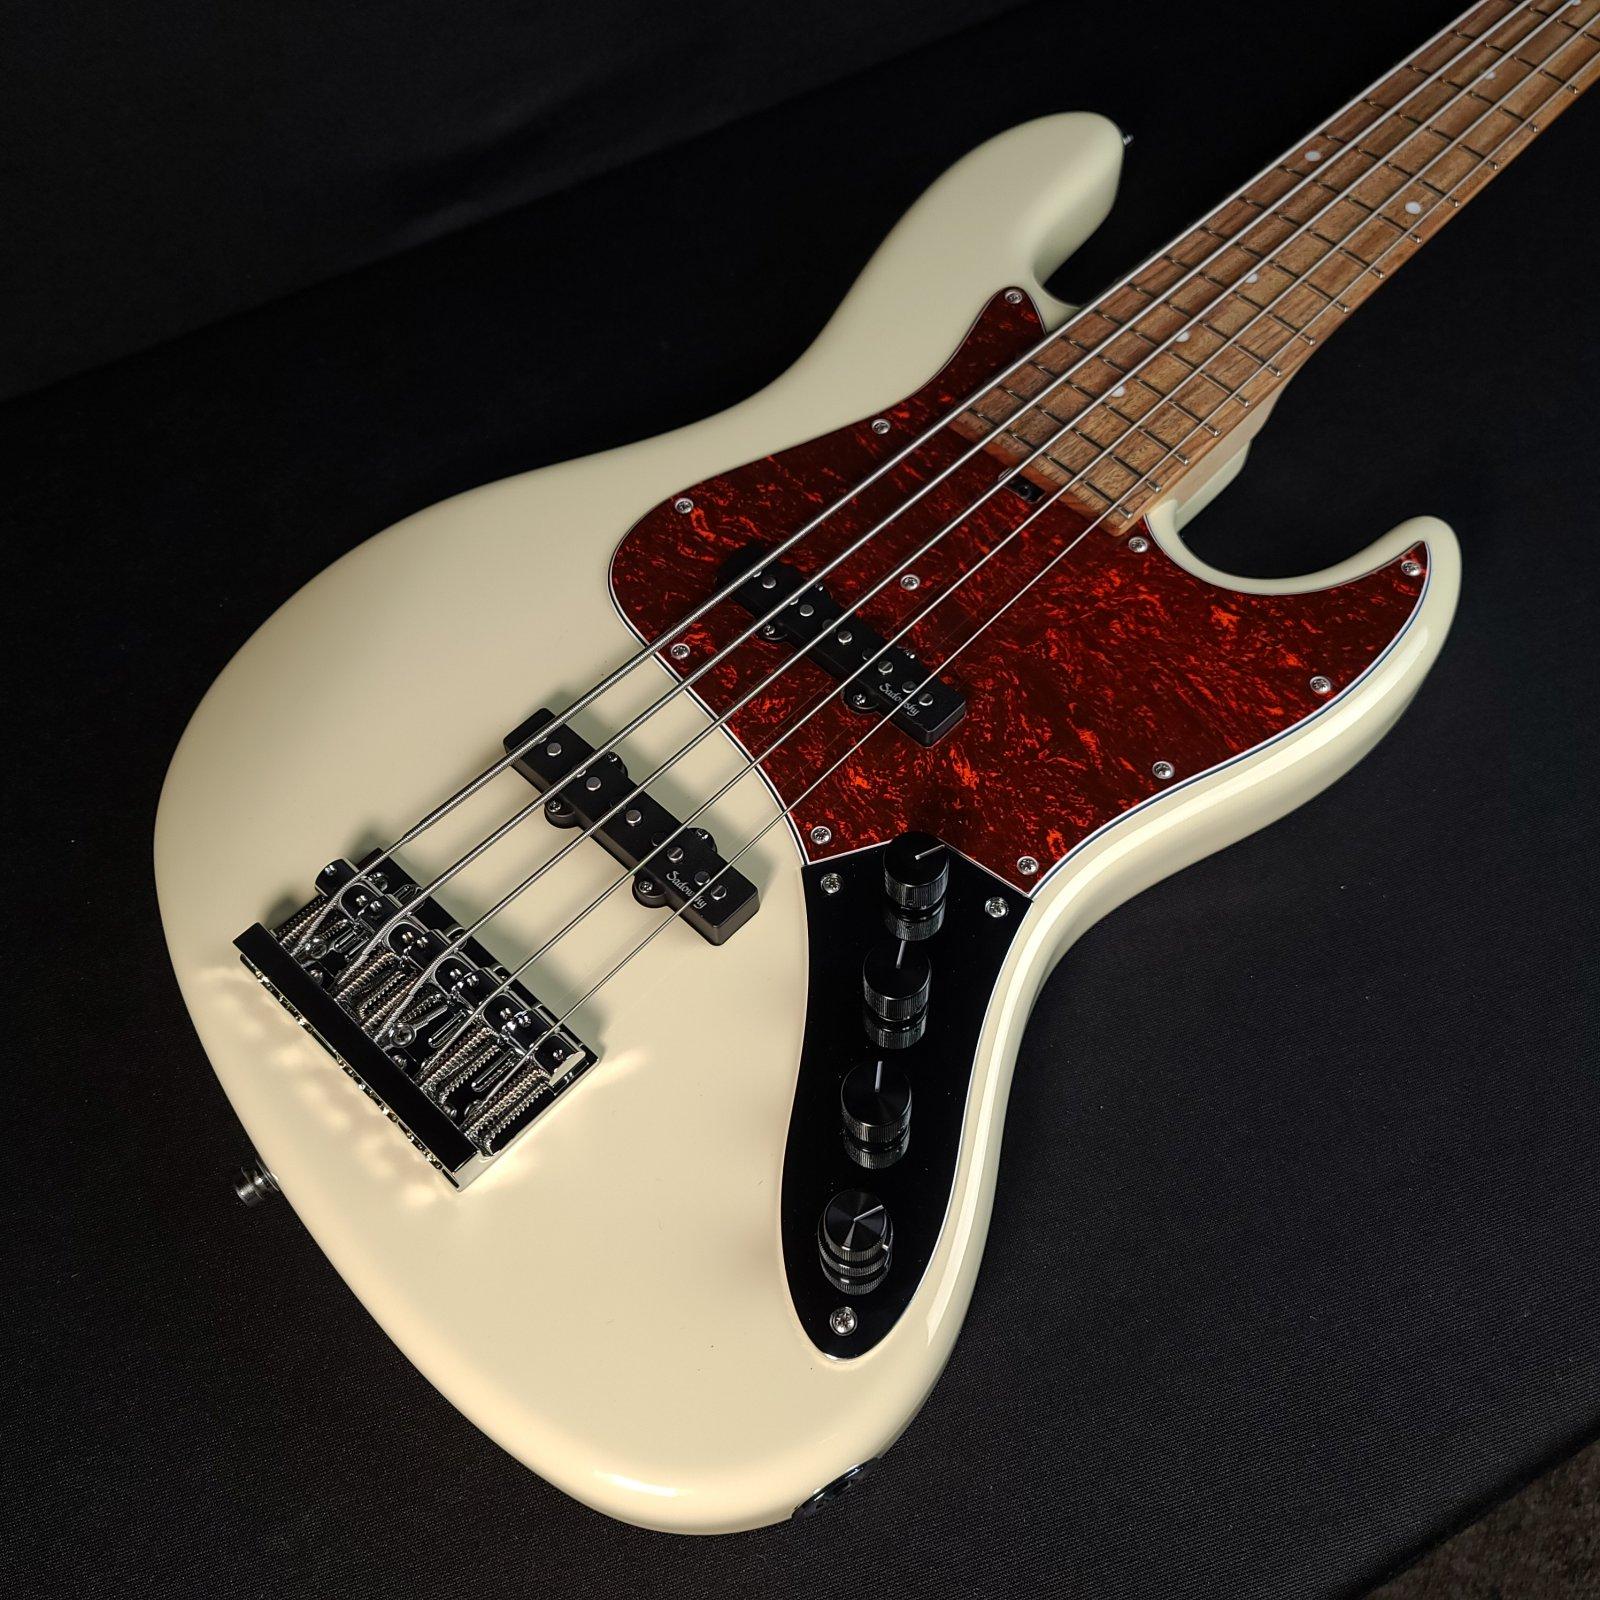 Sadowsky MetroLine 21 fret Vintage J/J Bass Olympic White